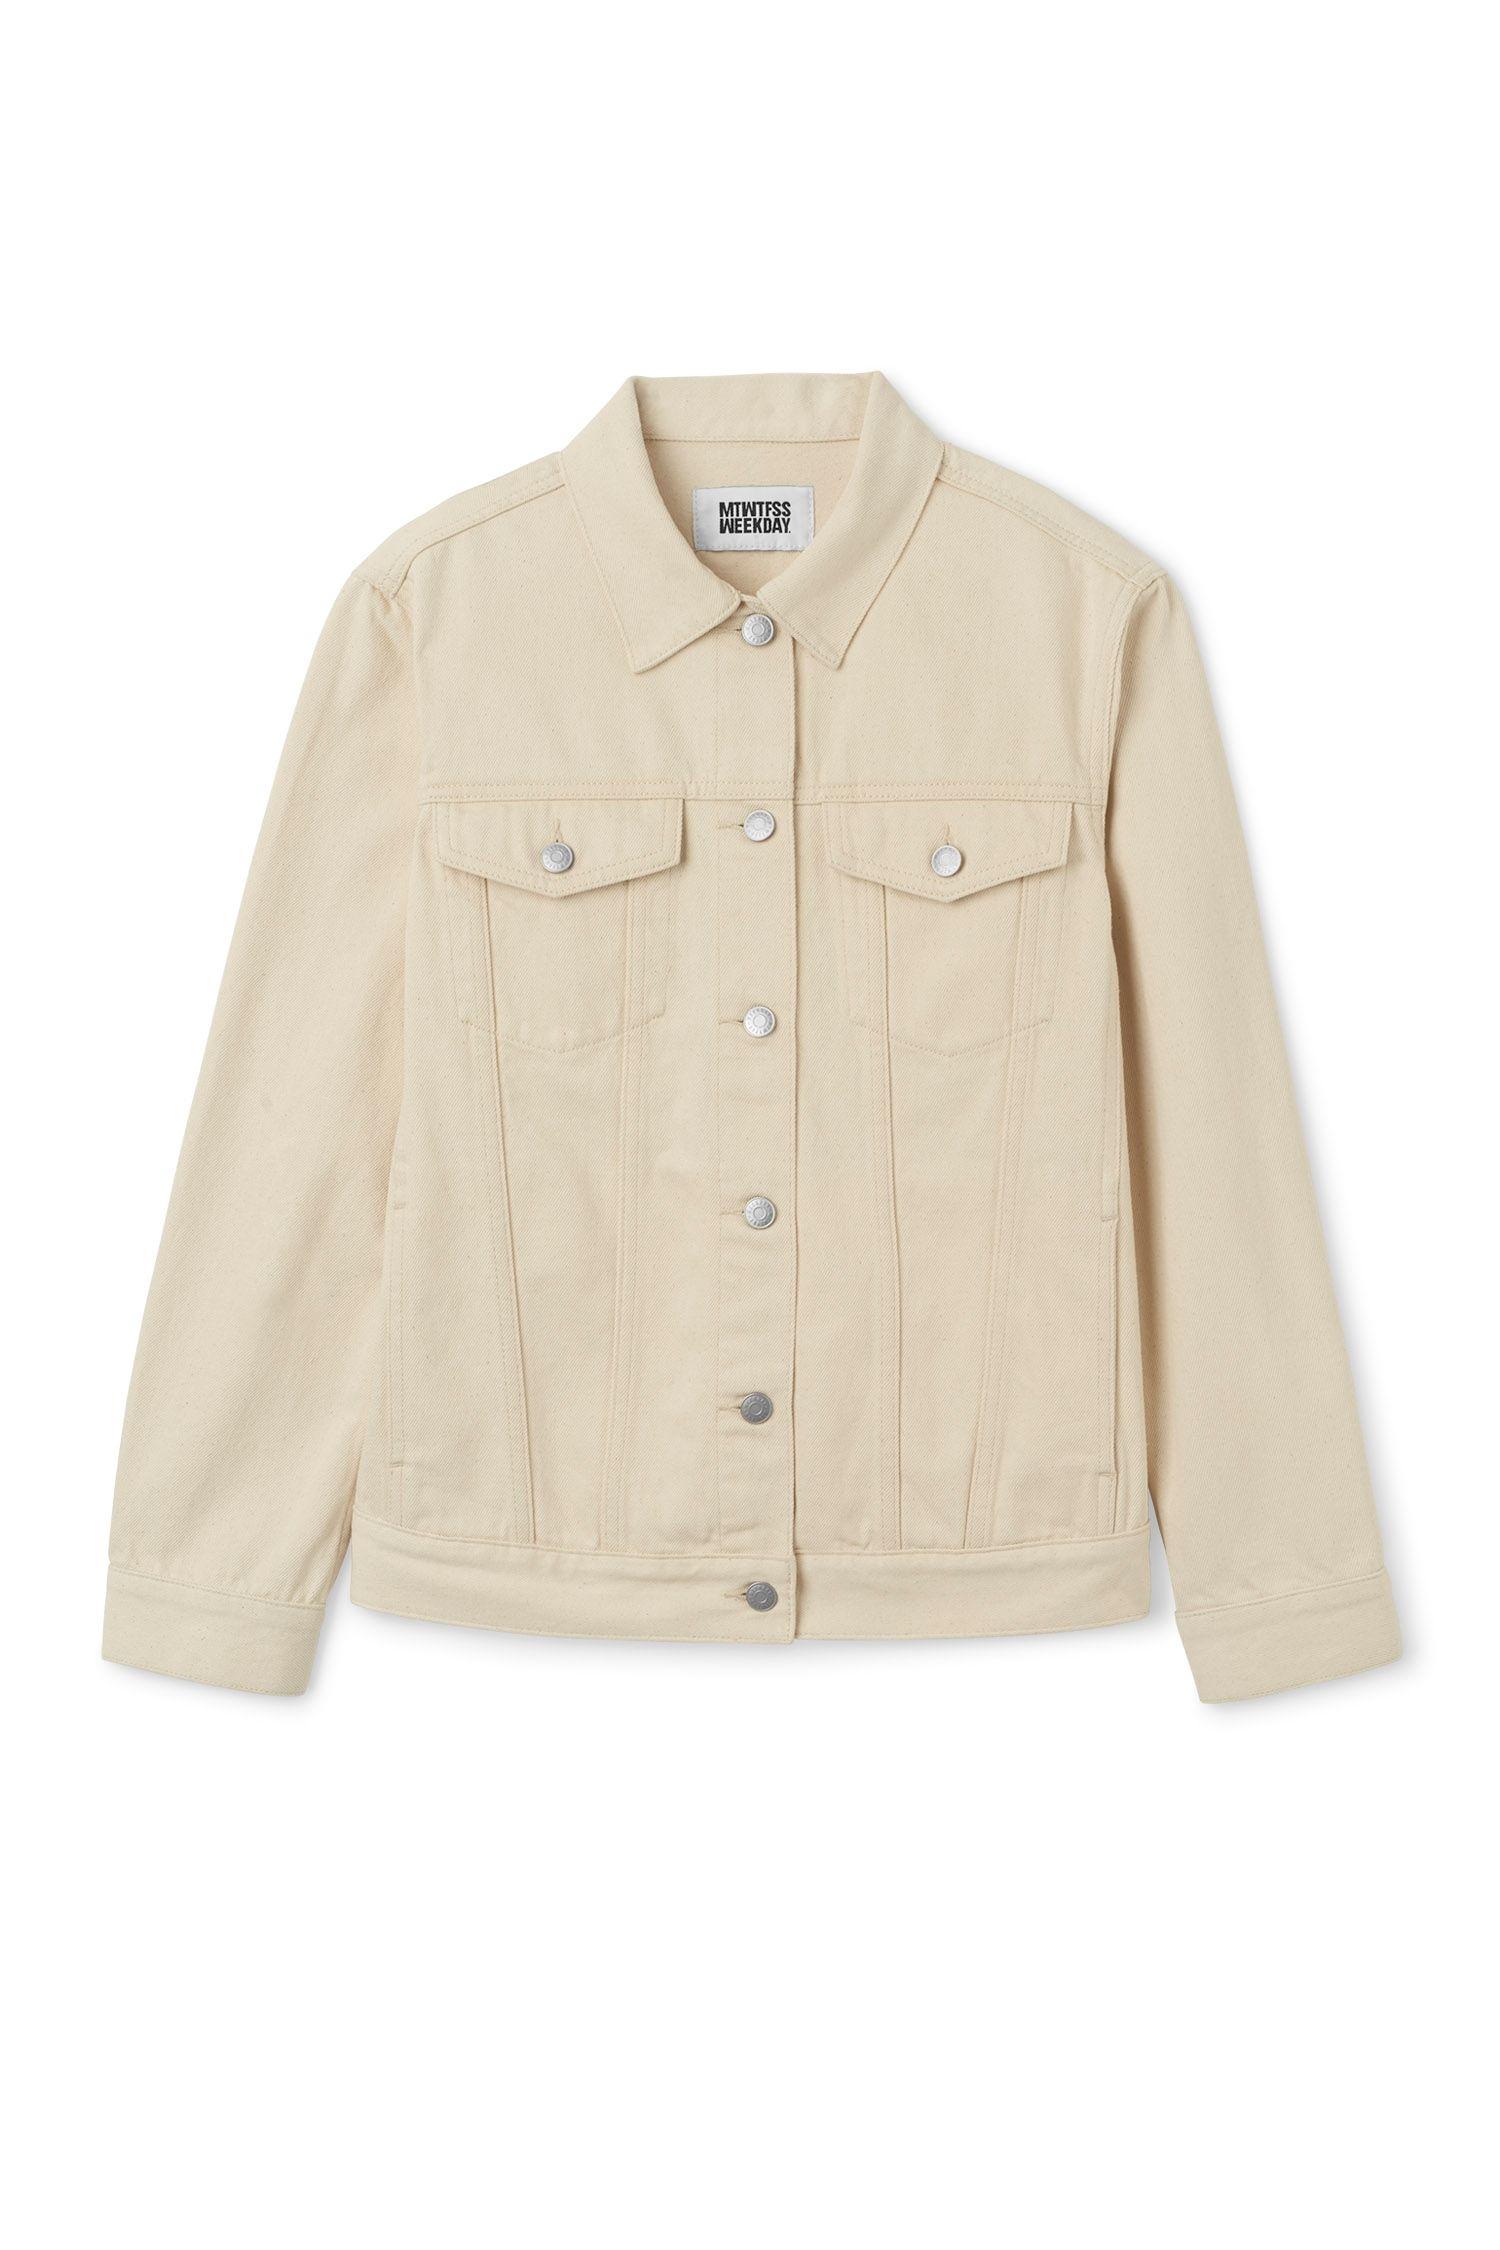 Weekday Image 1 Of Double Denim Jacket Ecru In Beige Light Brown Denim Jacket Denim Jacket Men Brown Jean Jacket [ 2250 x 1500 Pixel ]